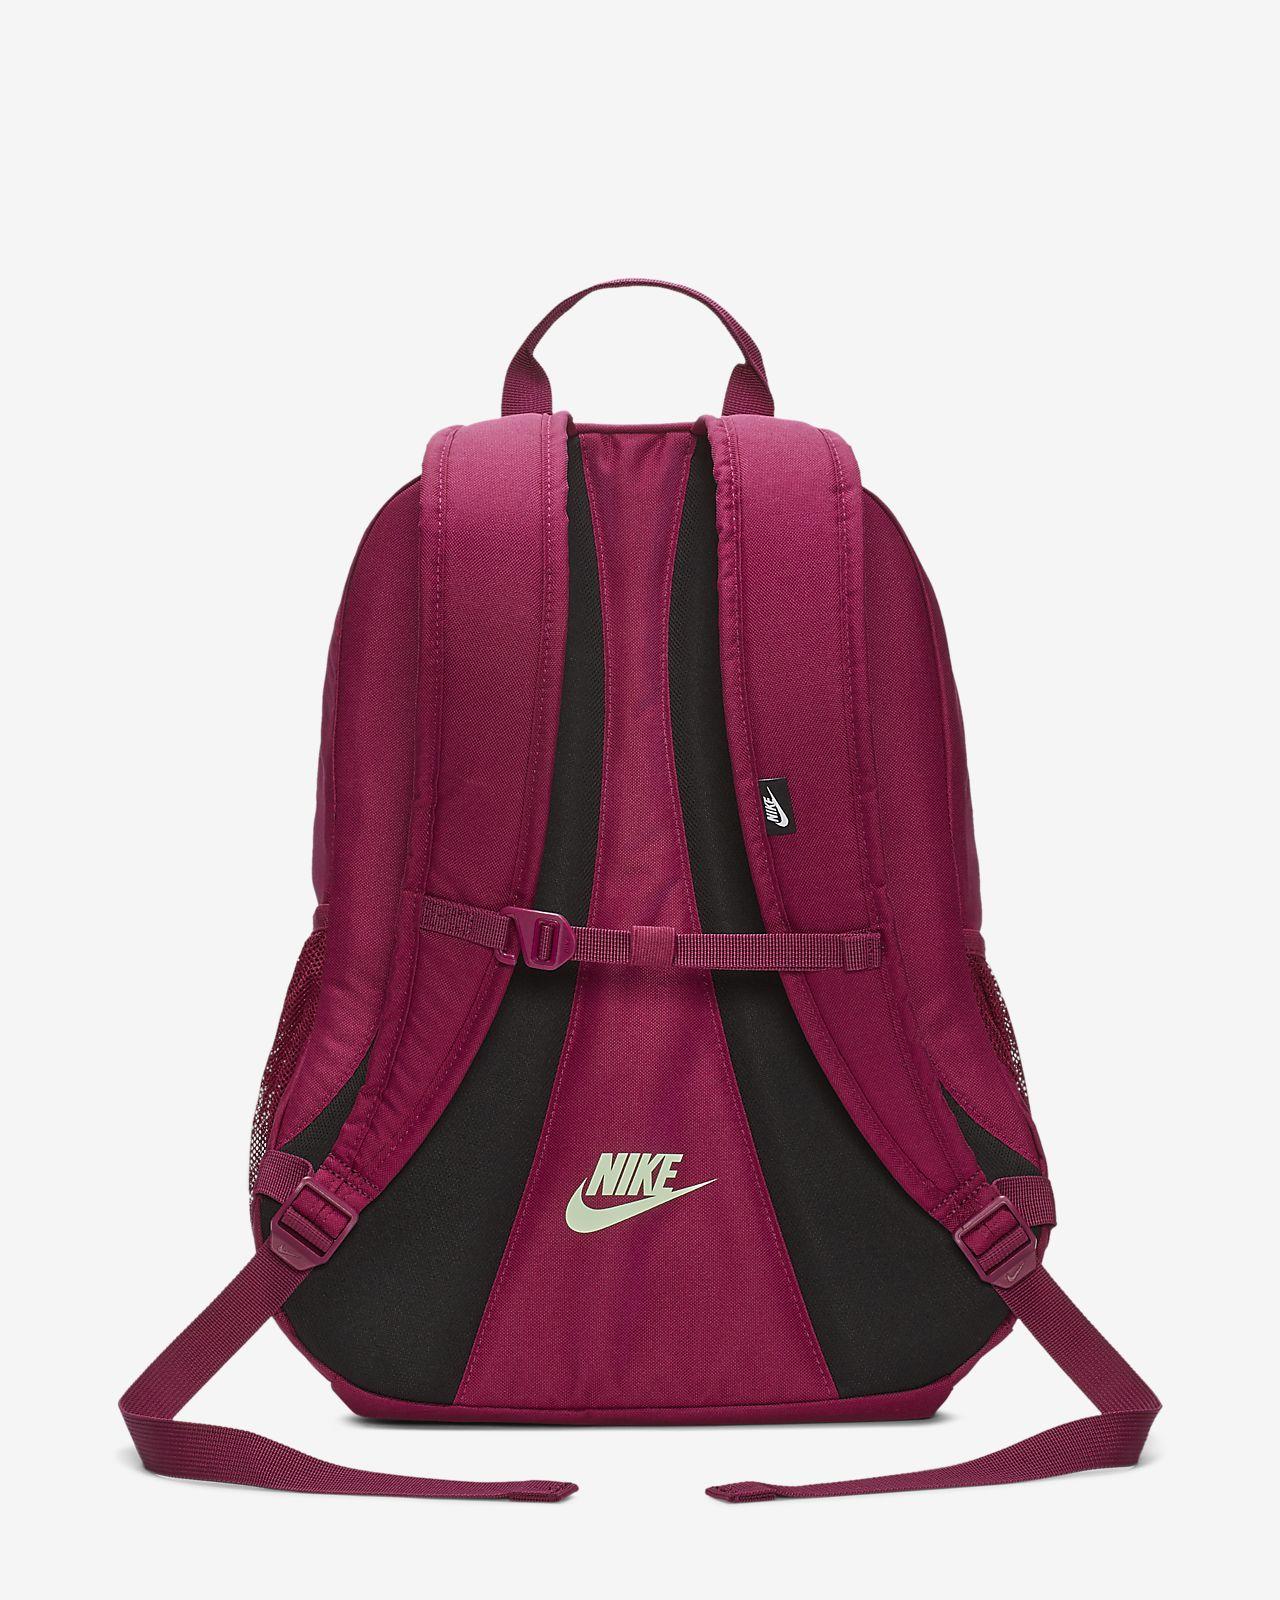 985a6d273b66b Nike Sportswear Hayward Futura 2.0 Backpack. Nike.com IN